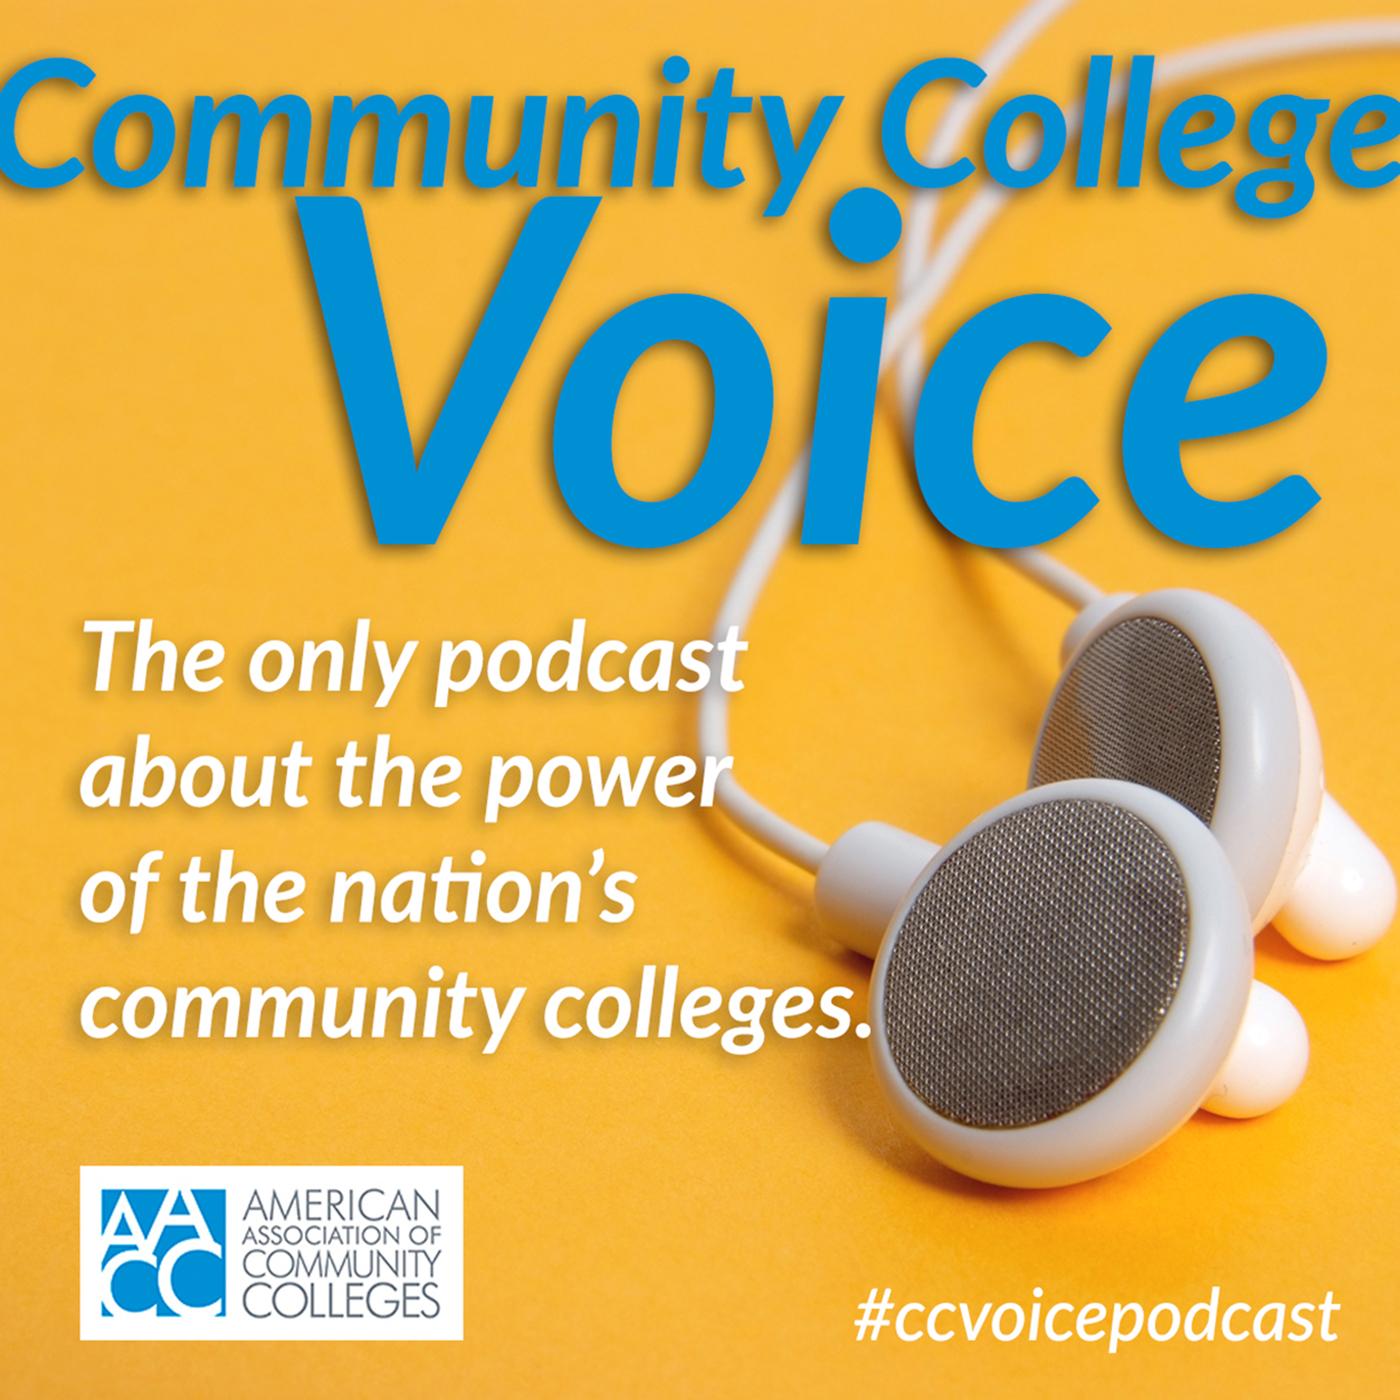 Community College Voice Podcast show art